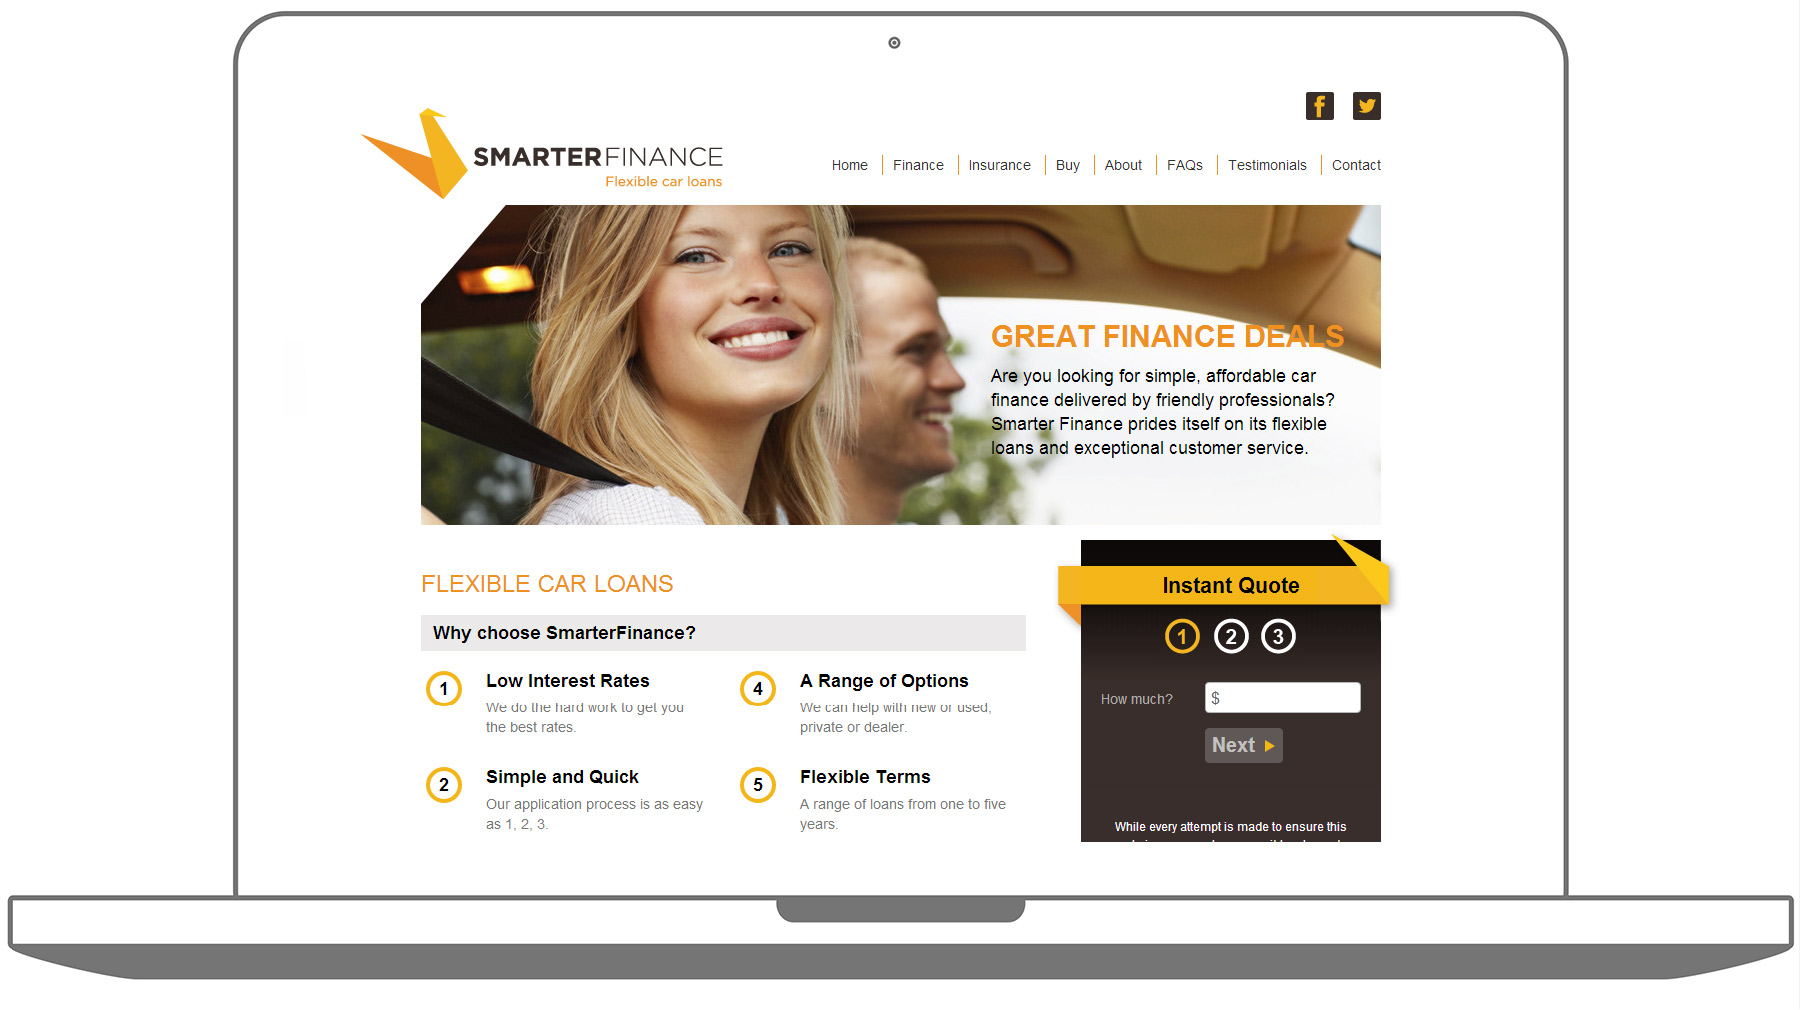 Smarter Finance главная страница сайта